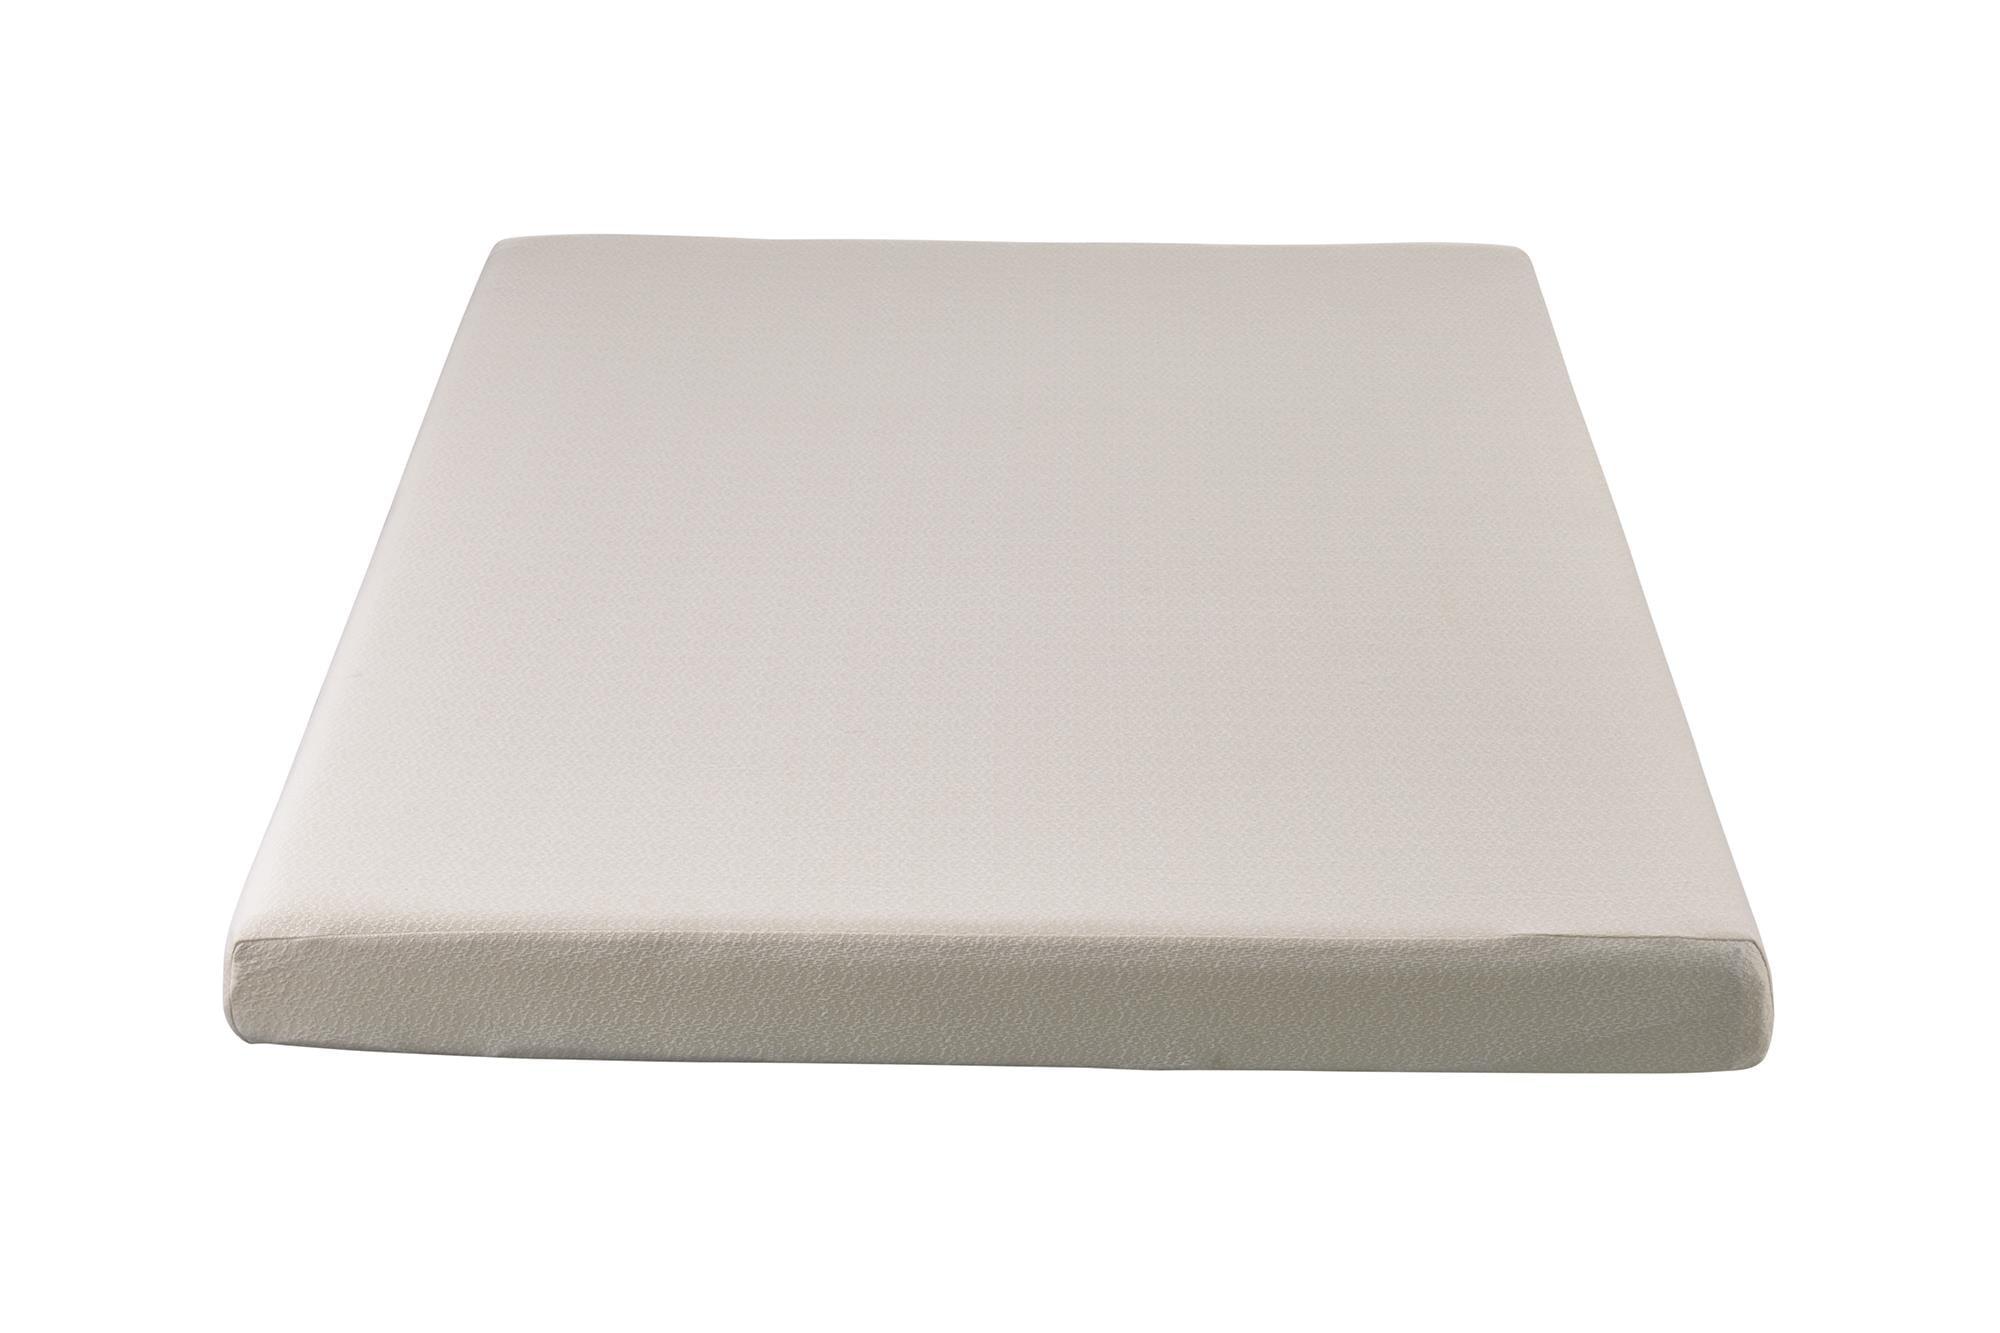 mohawk kitchen youtube by watch home mats memory foam mat